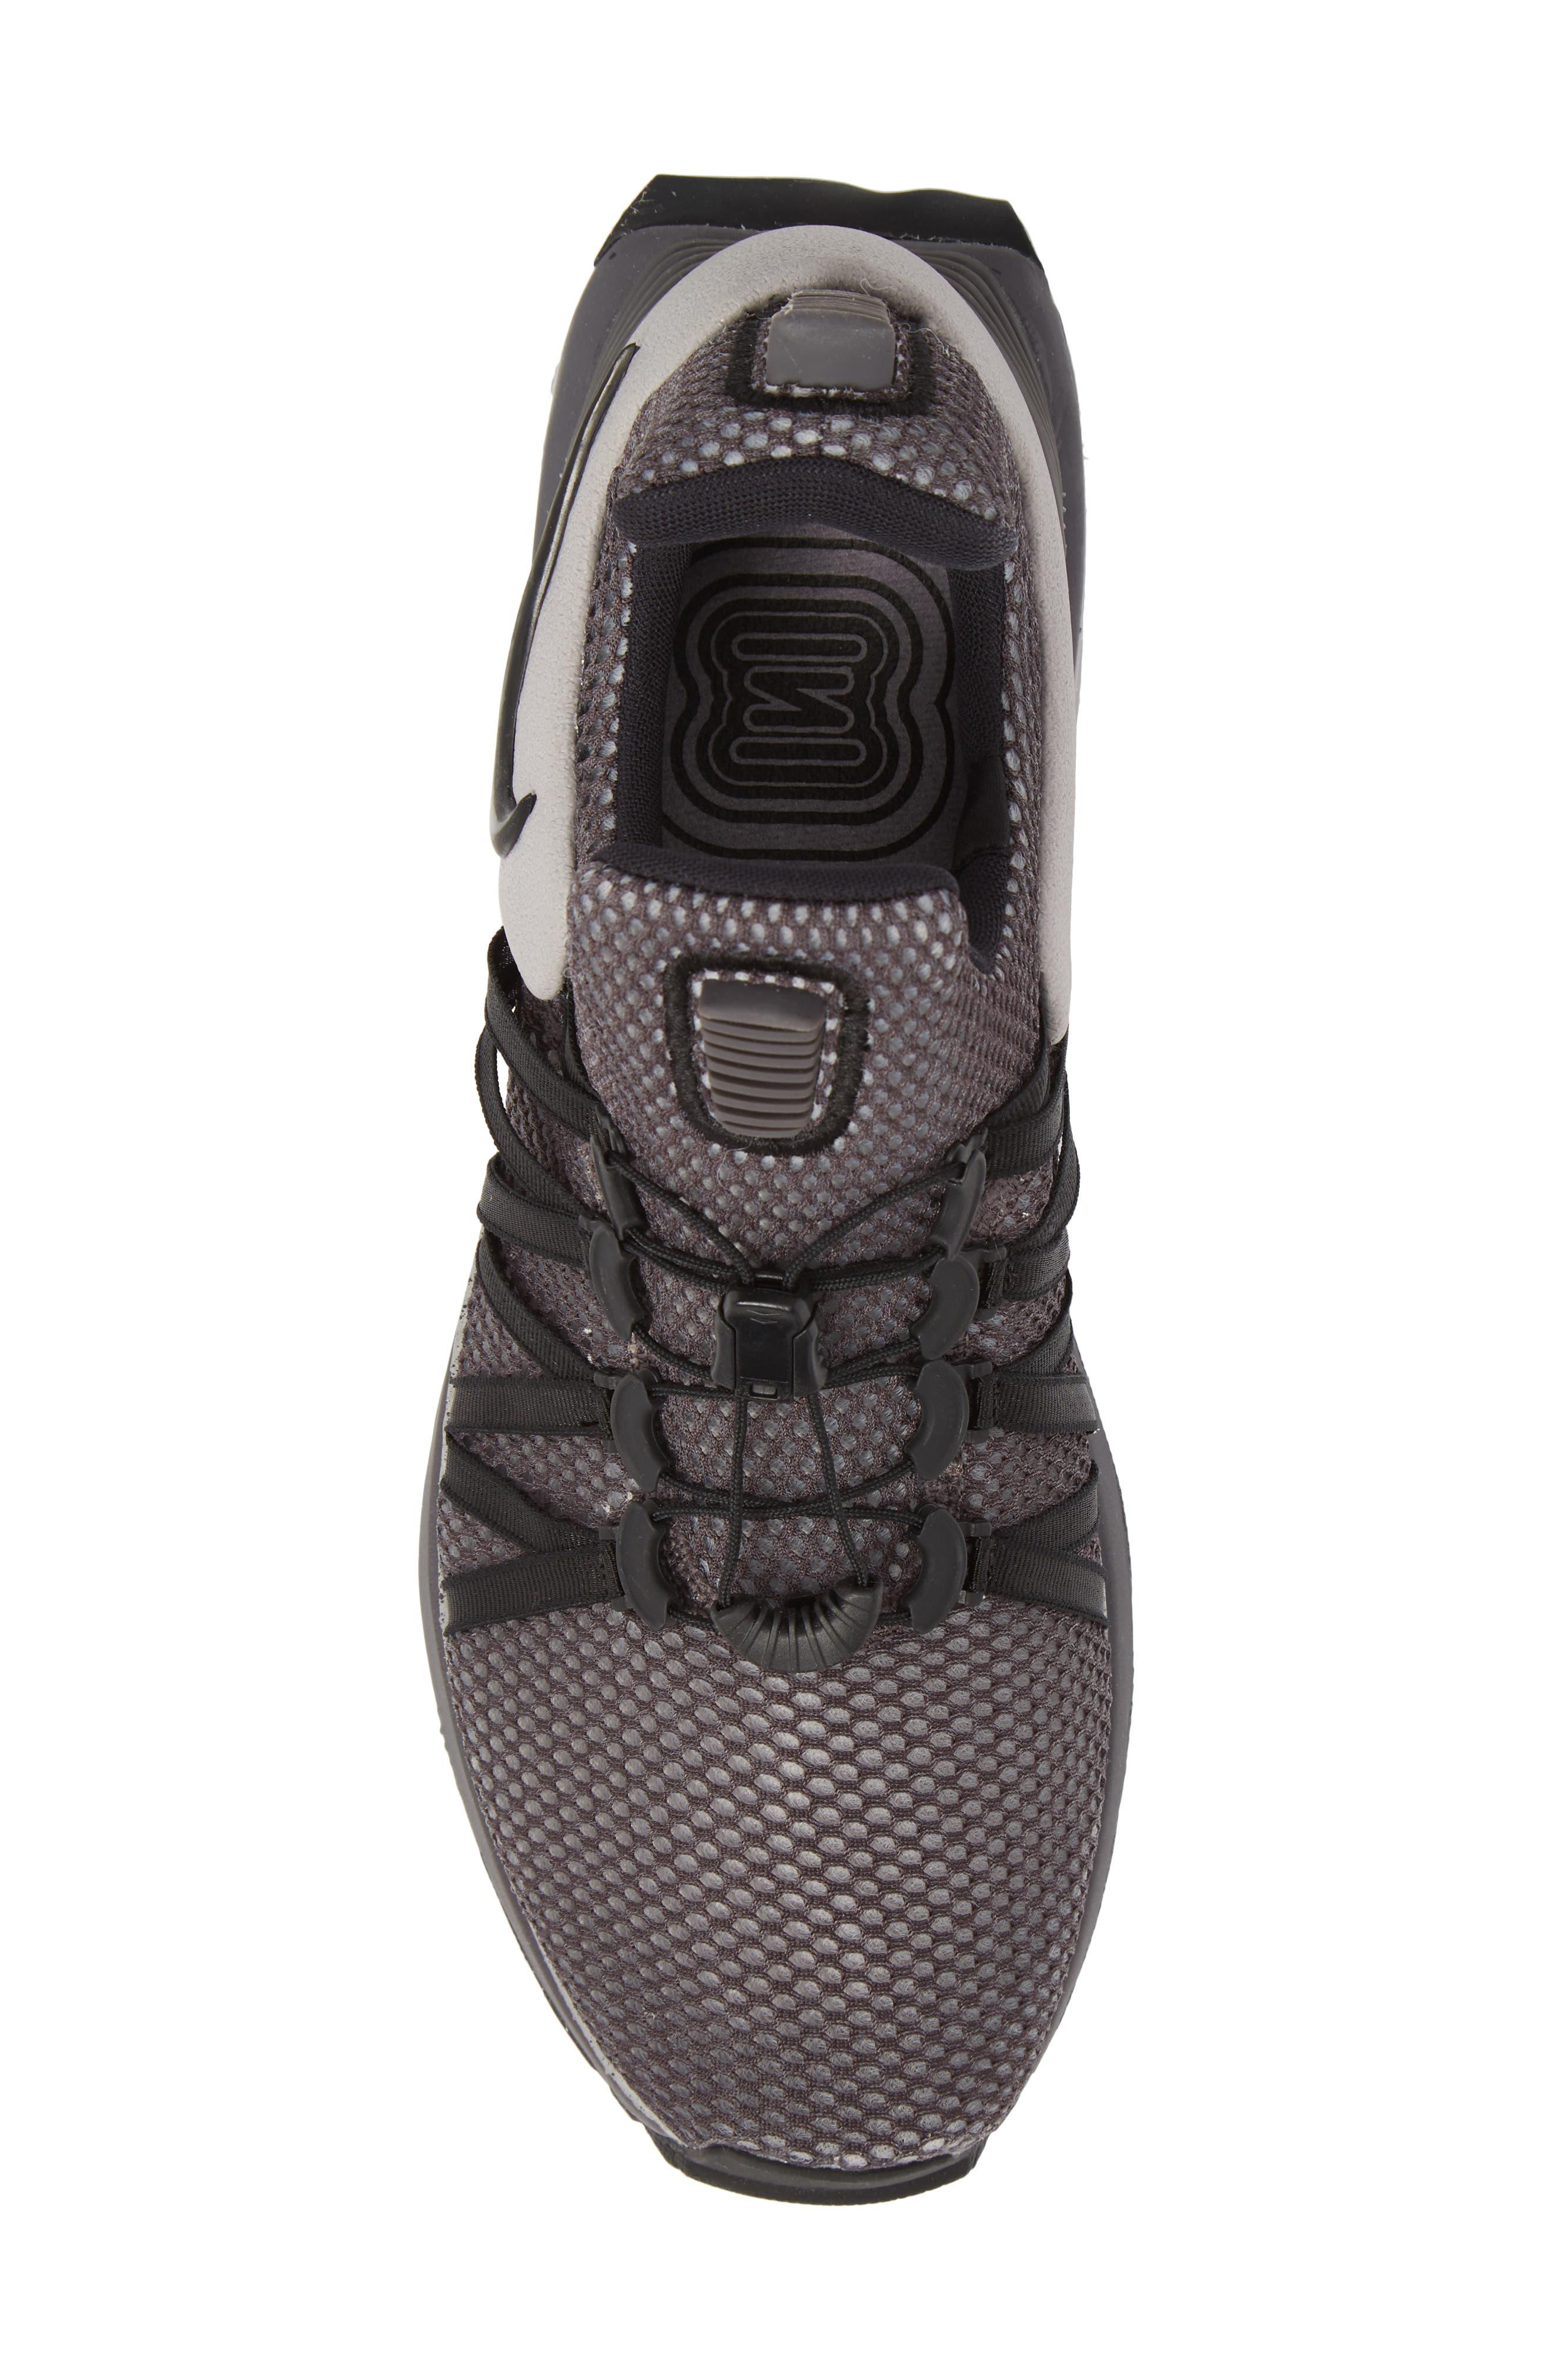 Shox Gravity Sneaker,                             Alternate thumbnail 5, color,                             ATMOSPHERE GREY/ BLACK/ GREY